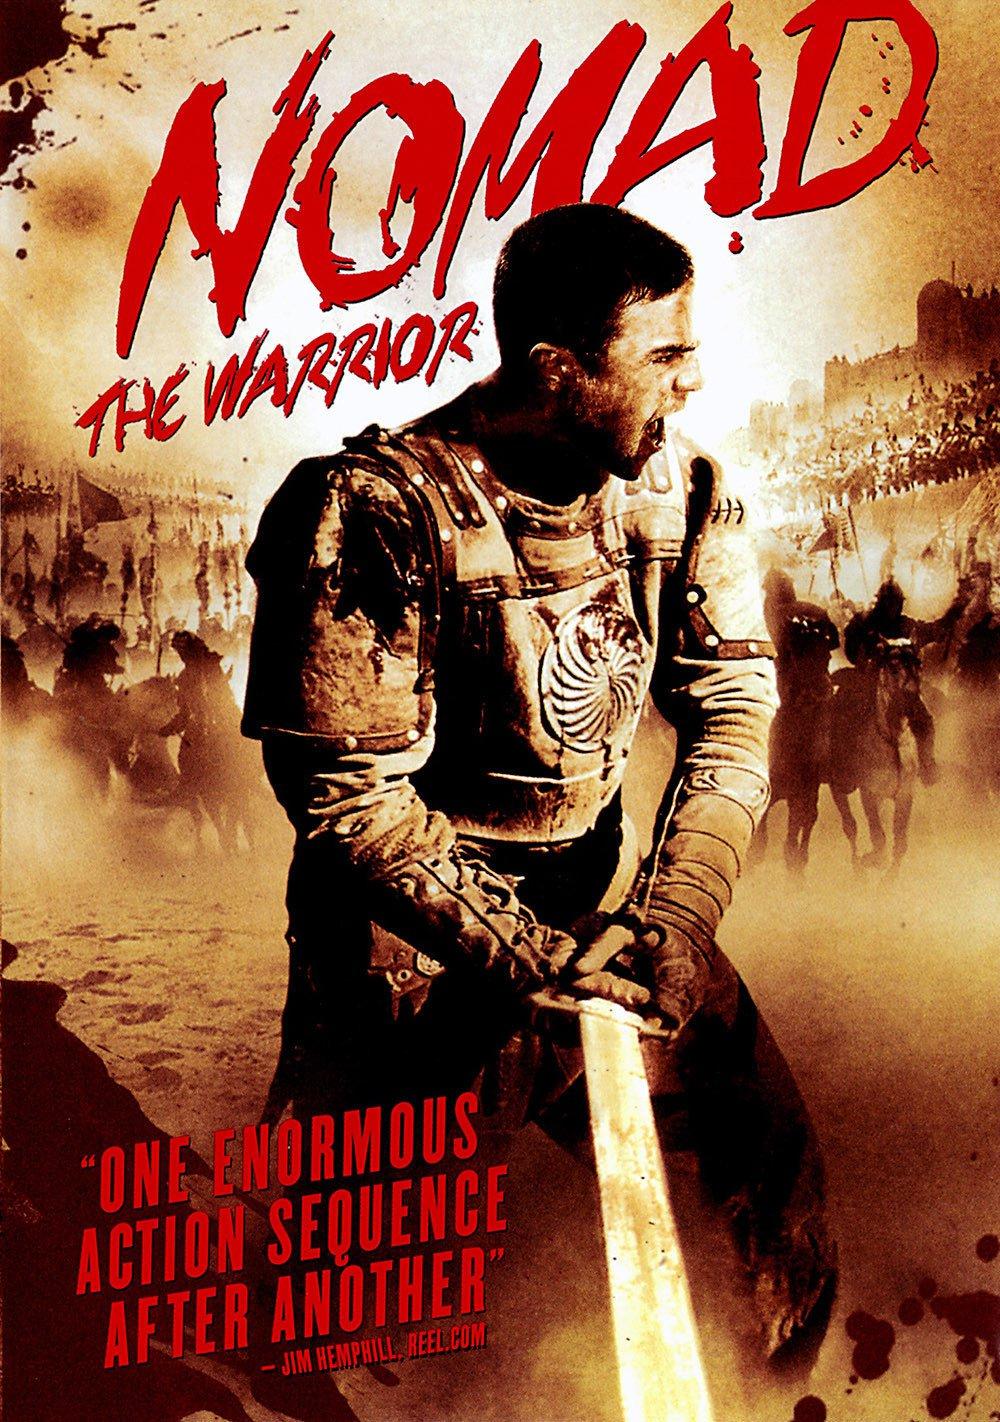 Nomad The Warrior จอมคนระบือโลก [HD][พากย์ไทย]